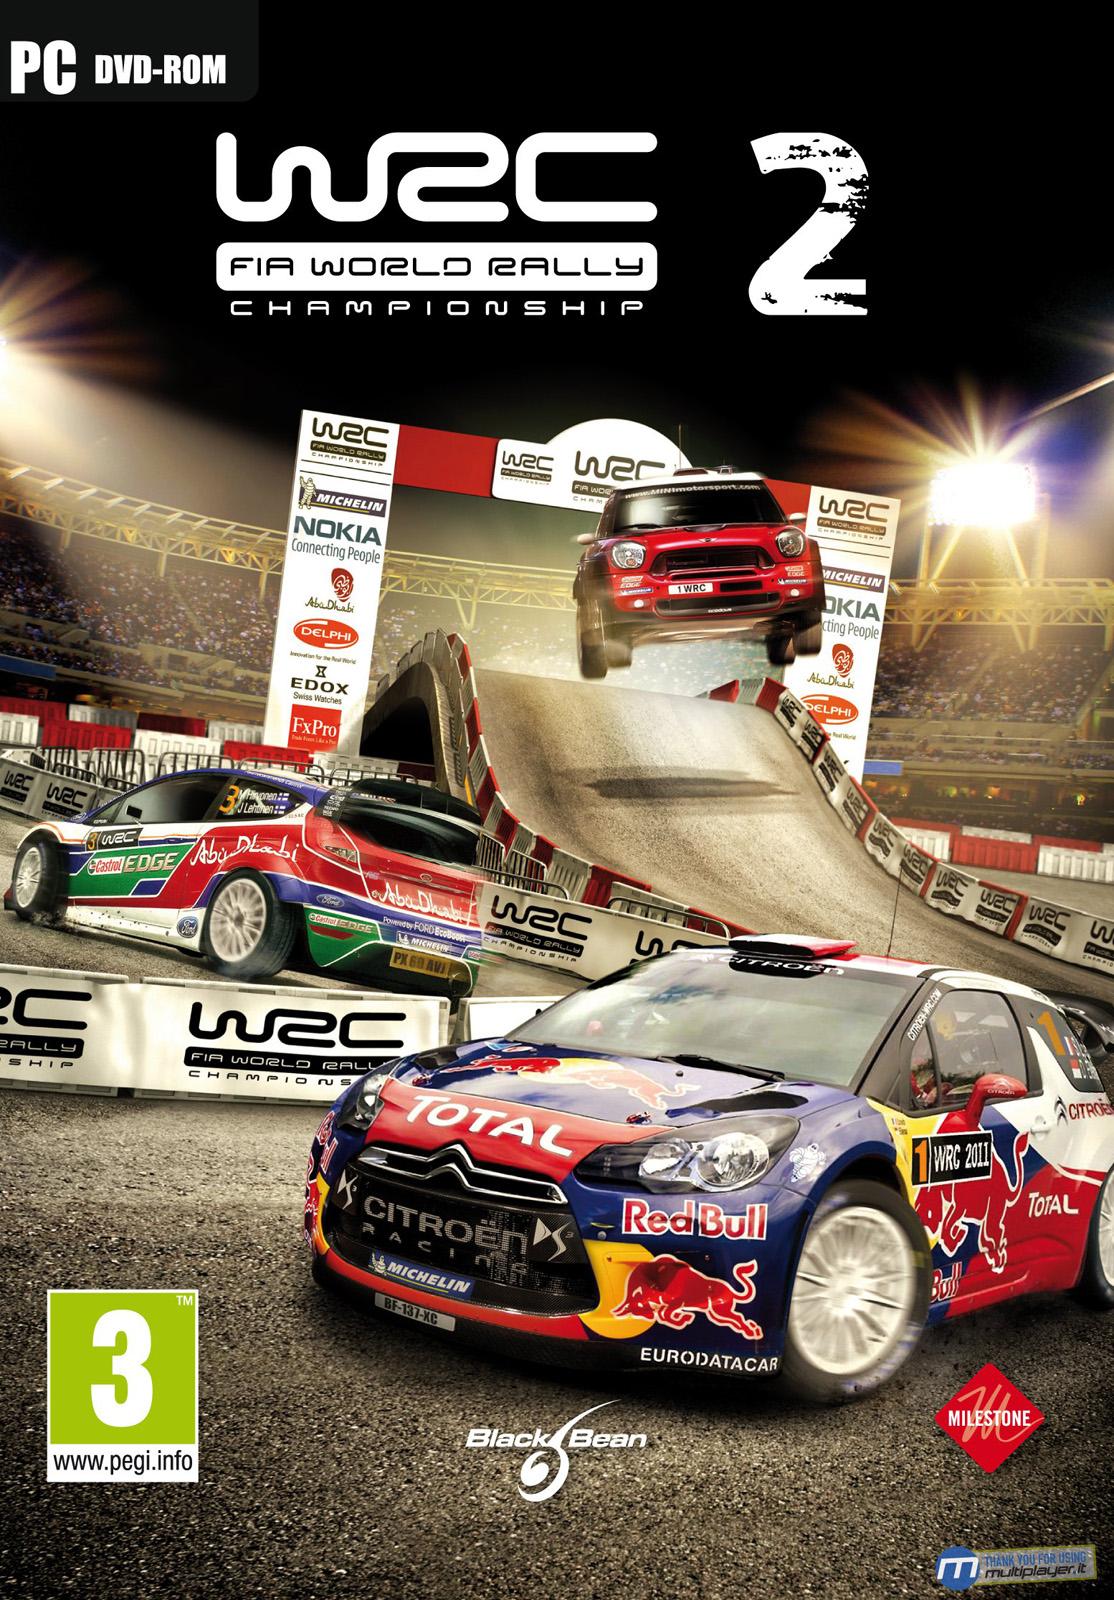 Скачать WRC FIA World Rally Championship Multi5 2011 без регистрации.